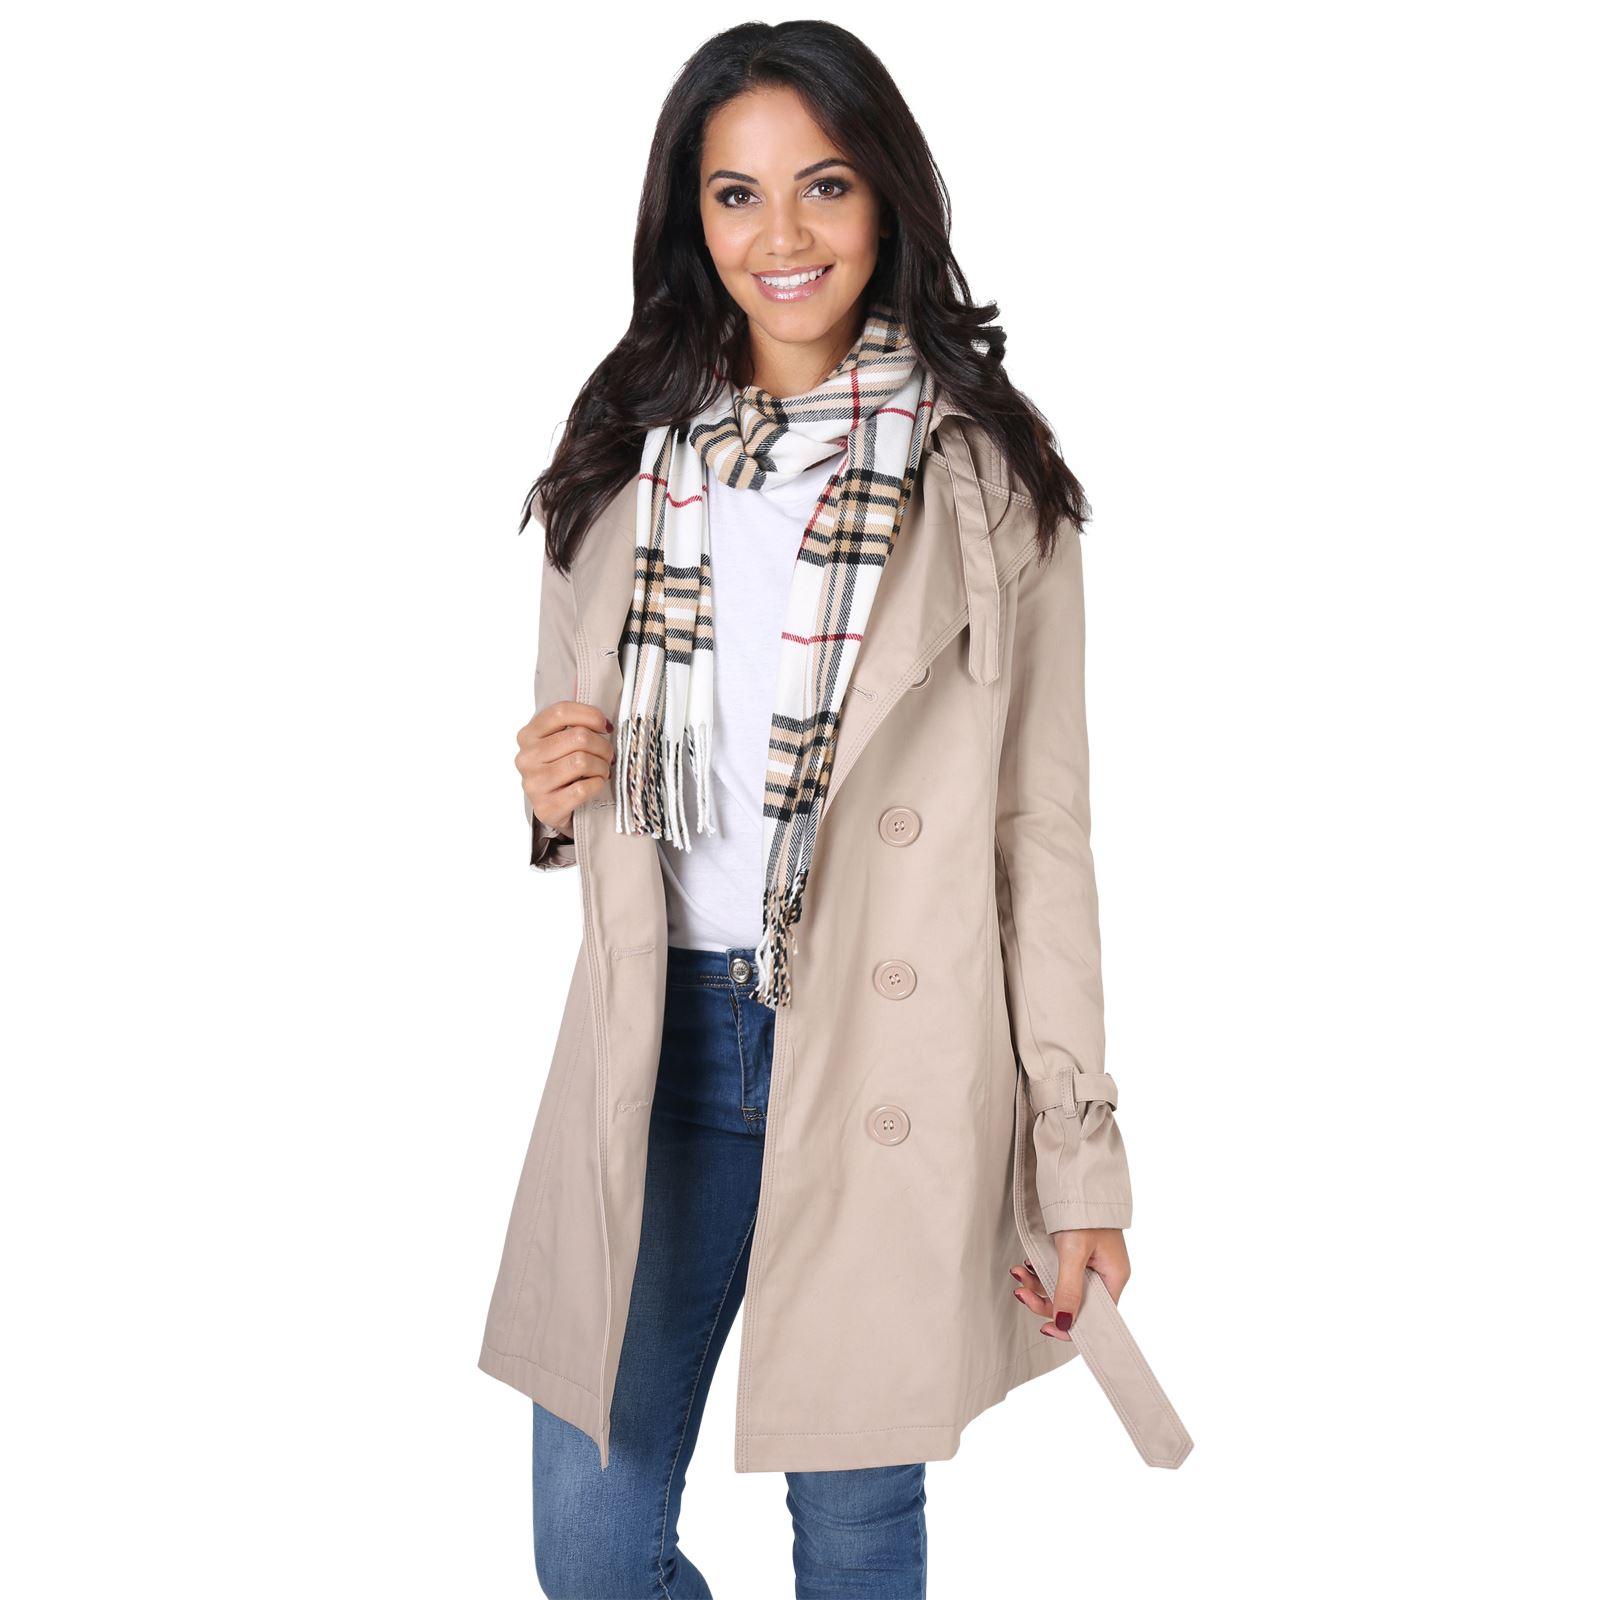 quality design ceb69 25ddb Damen Klassischer Trenchcoat Kurzmantel Winter Jacke Mantel ...